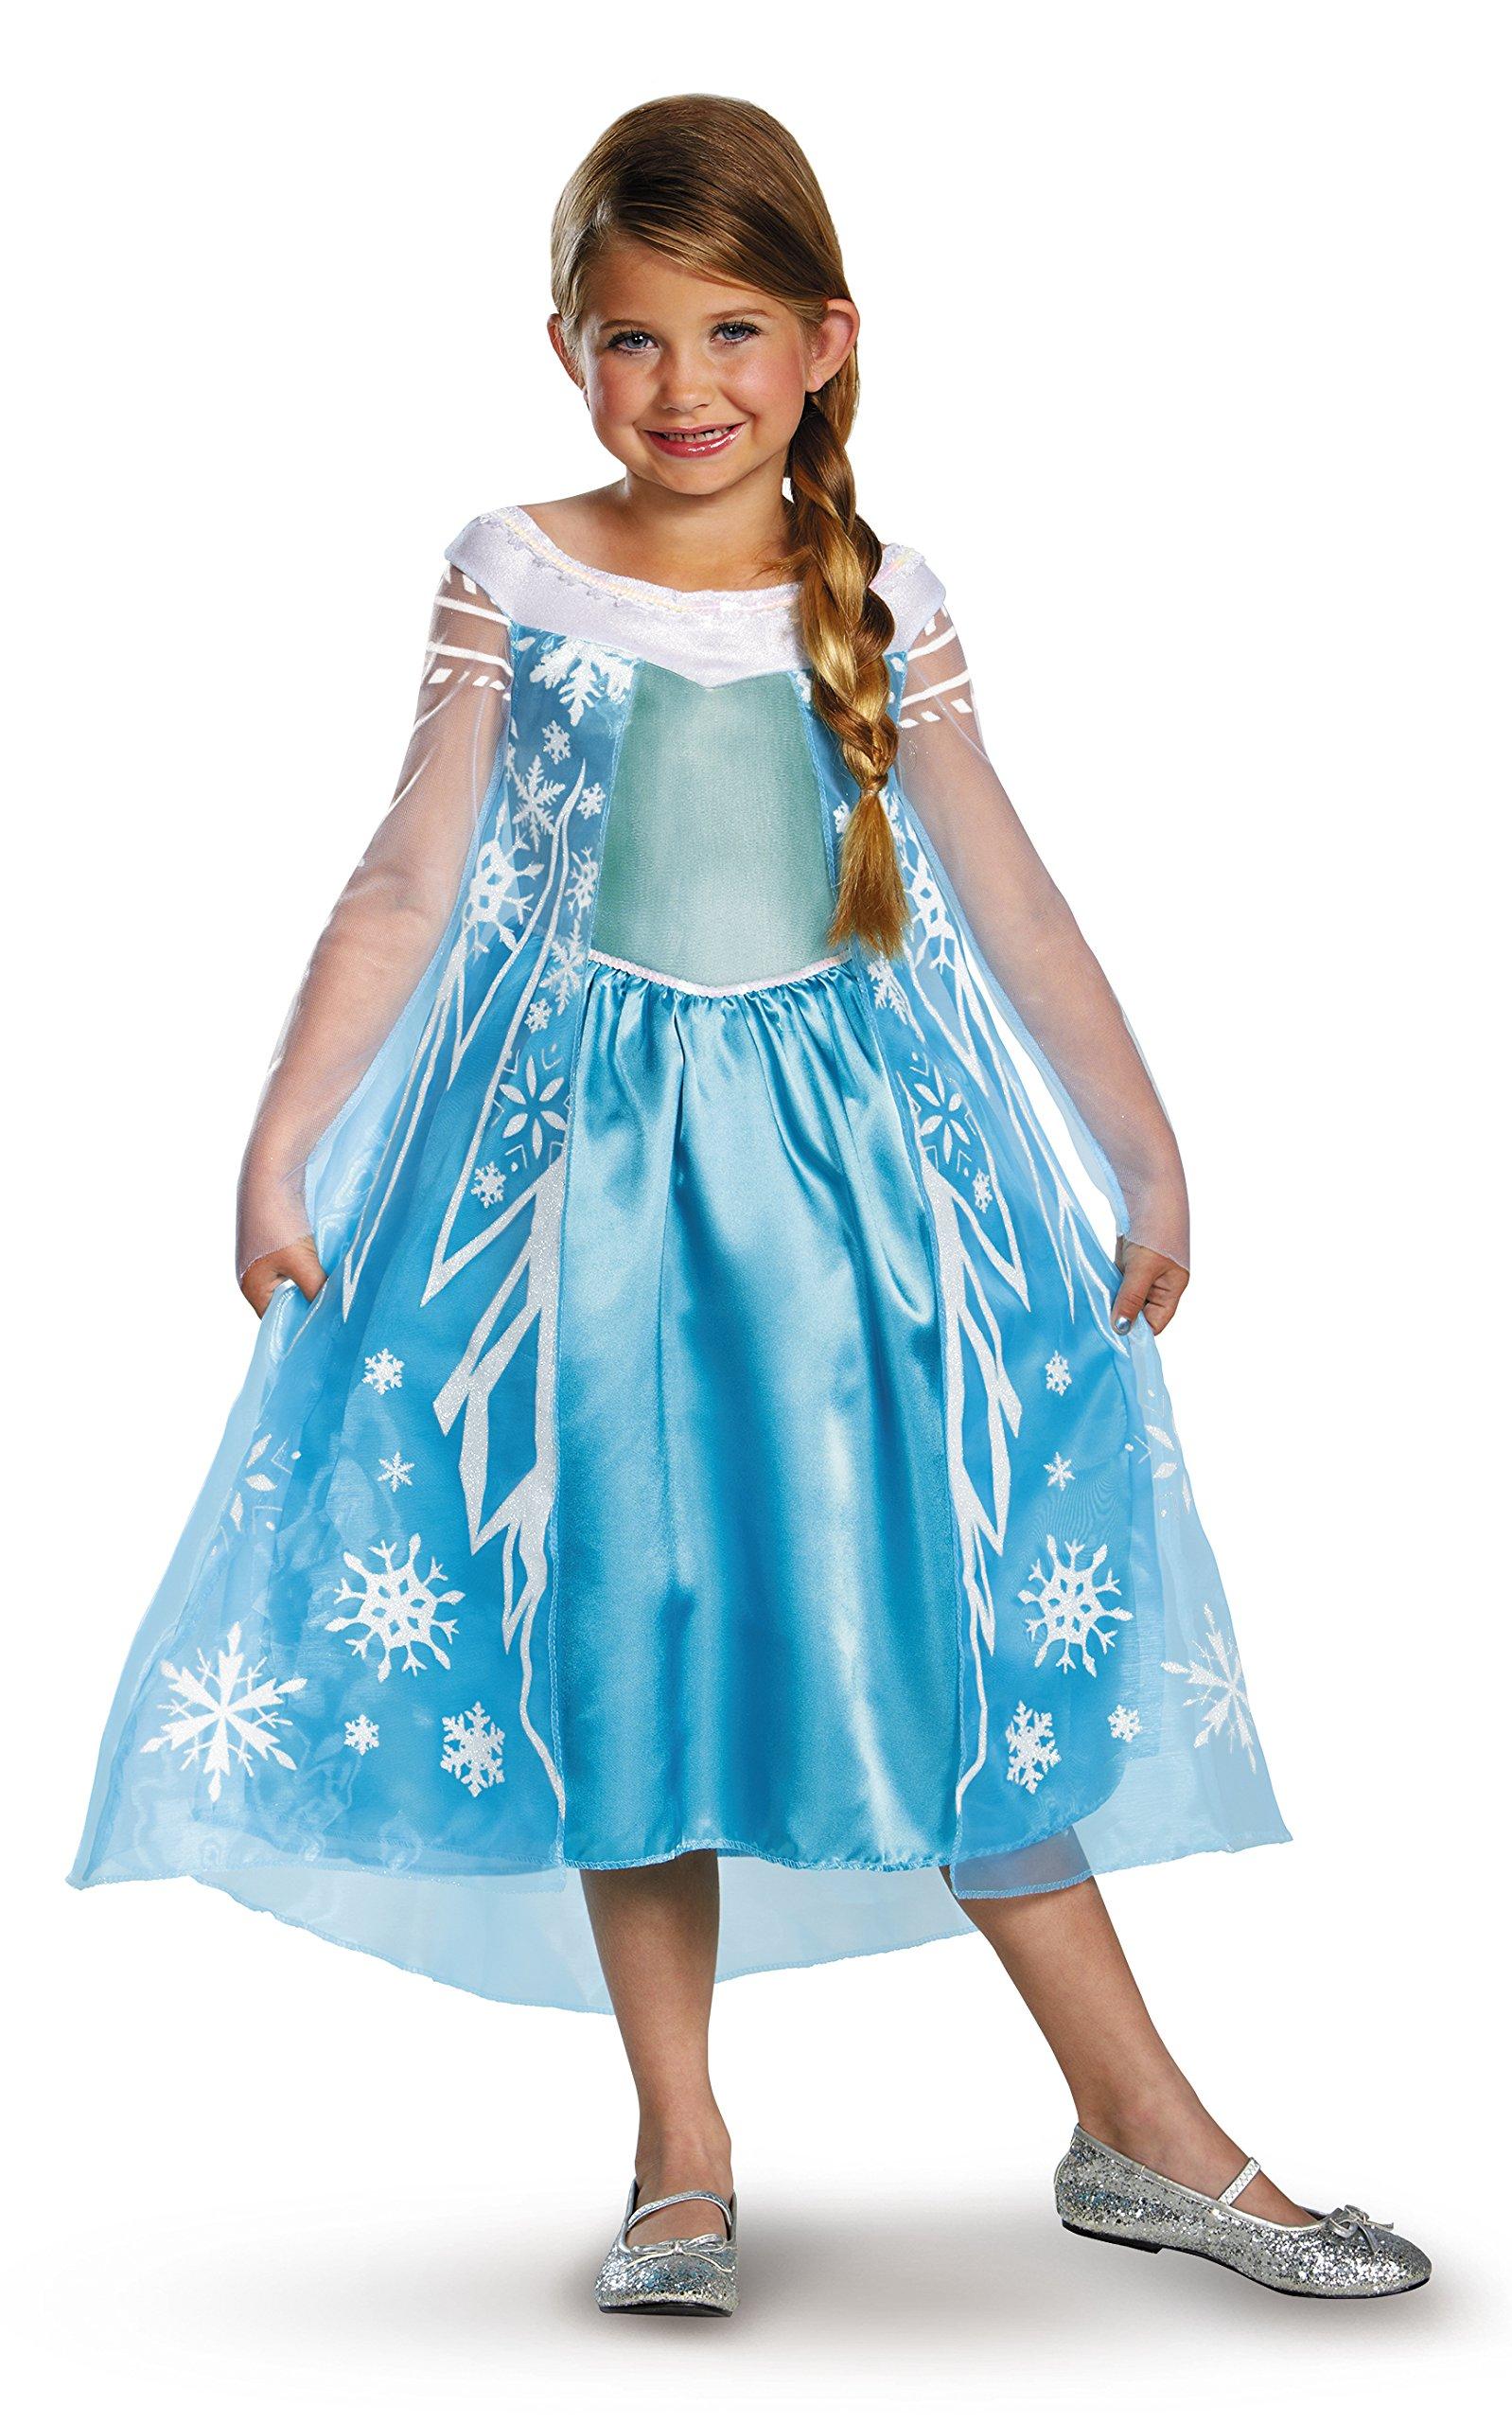 Girls Disney Frozen Elsa Deluxe Costume, X-Small/3-4 Tall